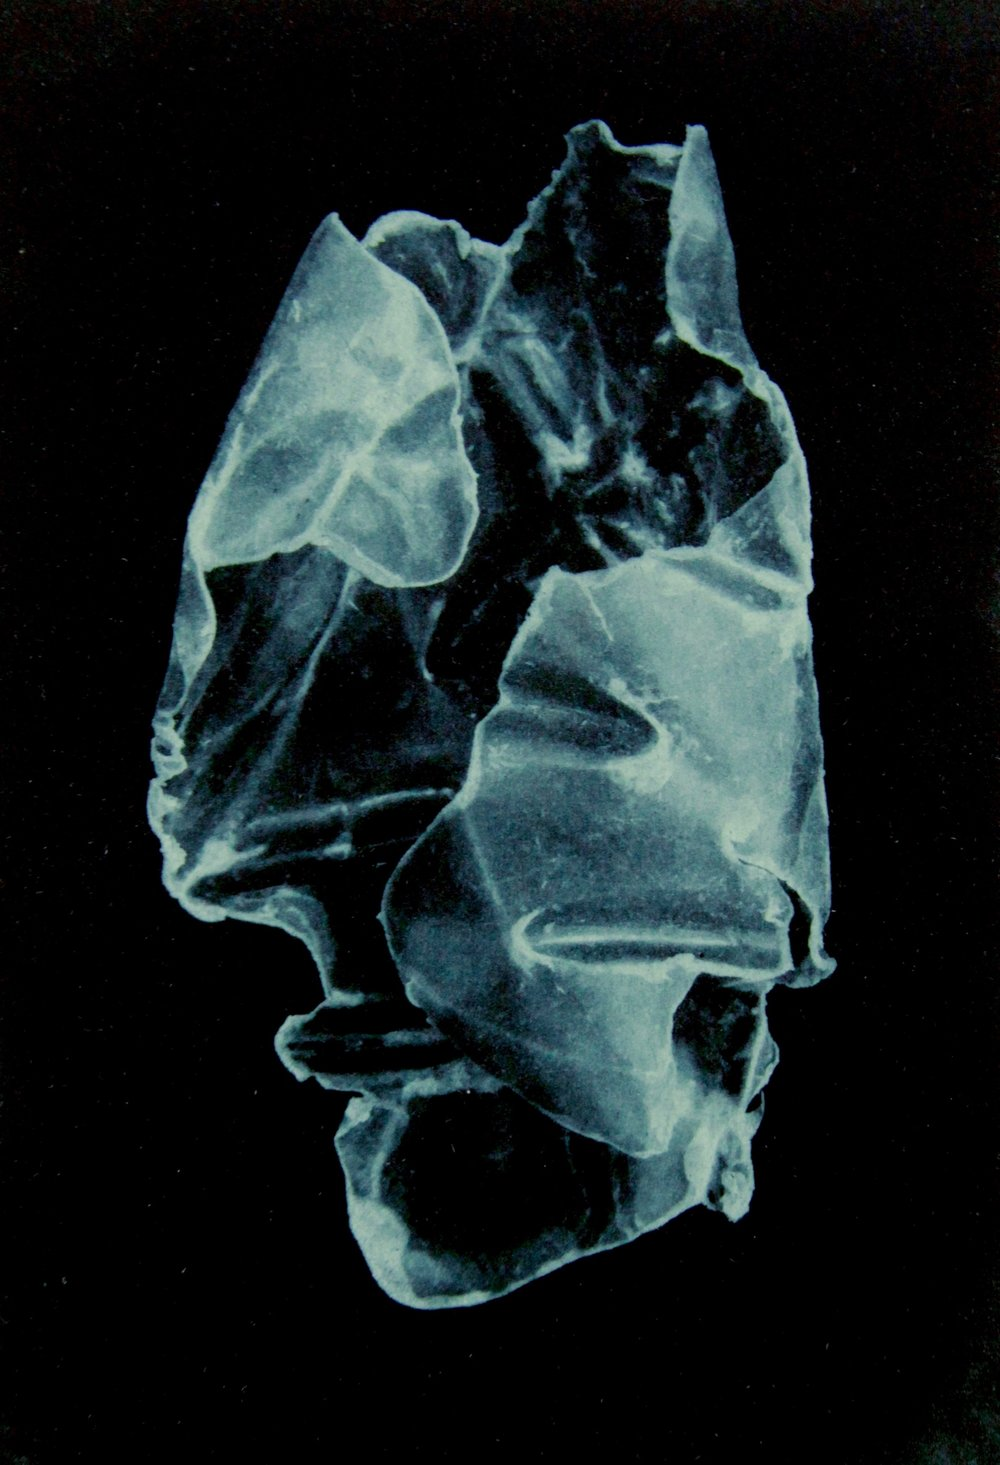 Pelagic Plastic   Photopolymer etching